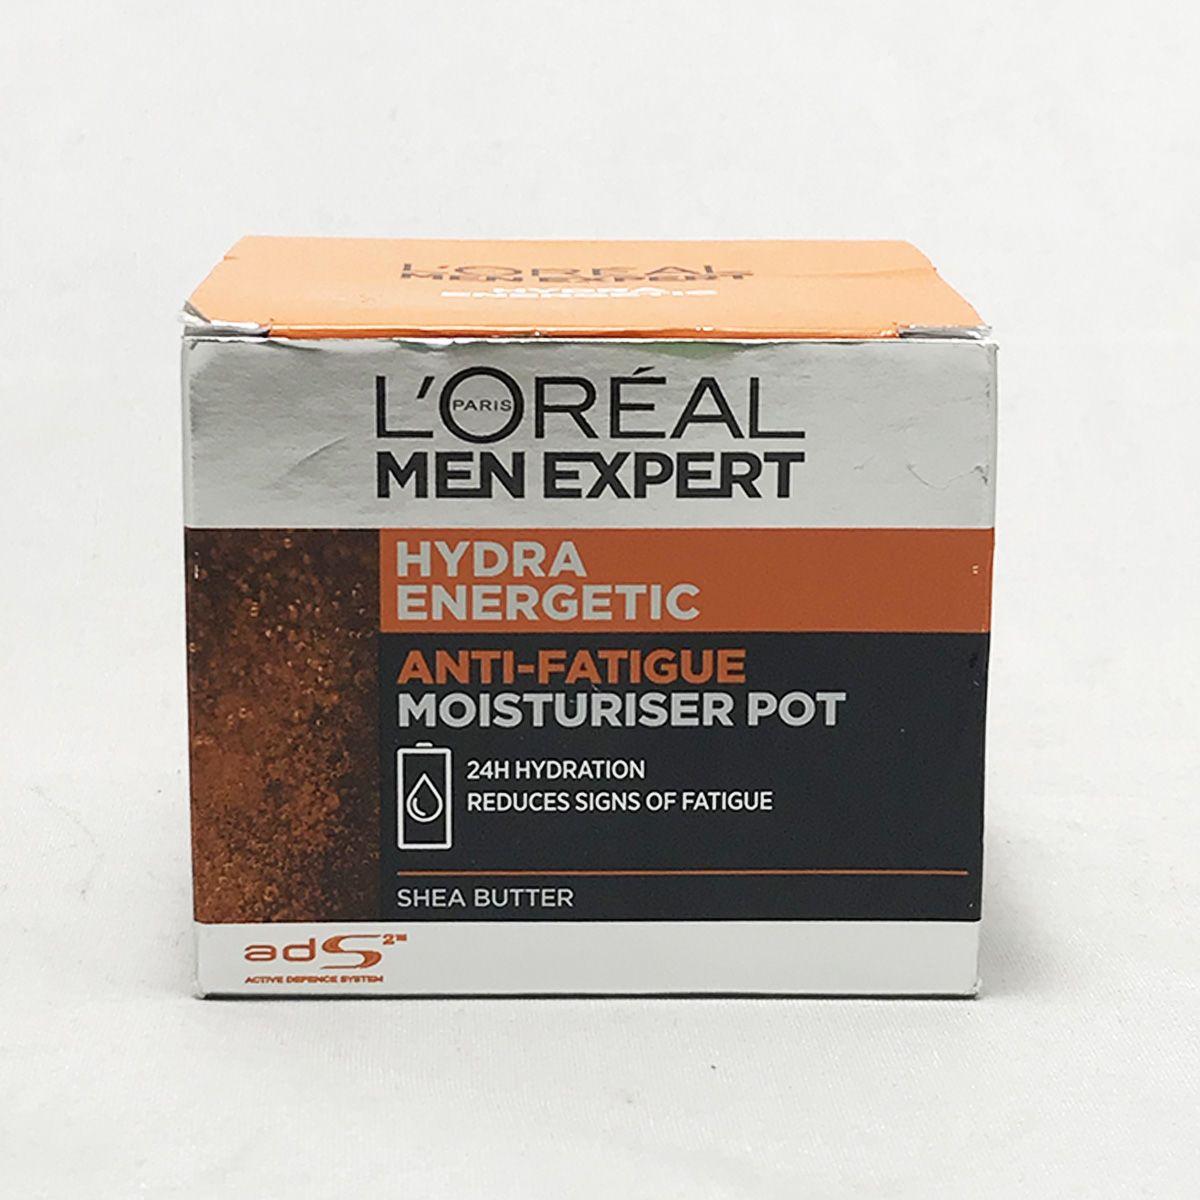 Loreal Paris Men Expert Hydra Energetic Anti Fatigue Moisturiser Pot 50 ml